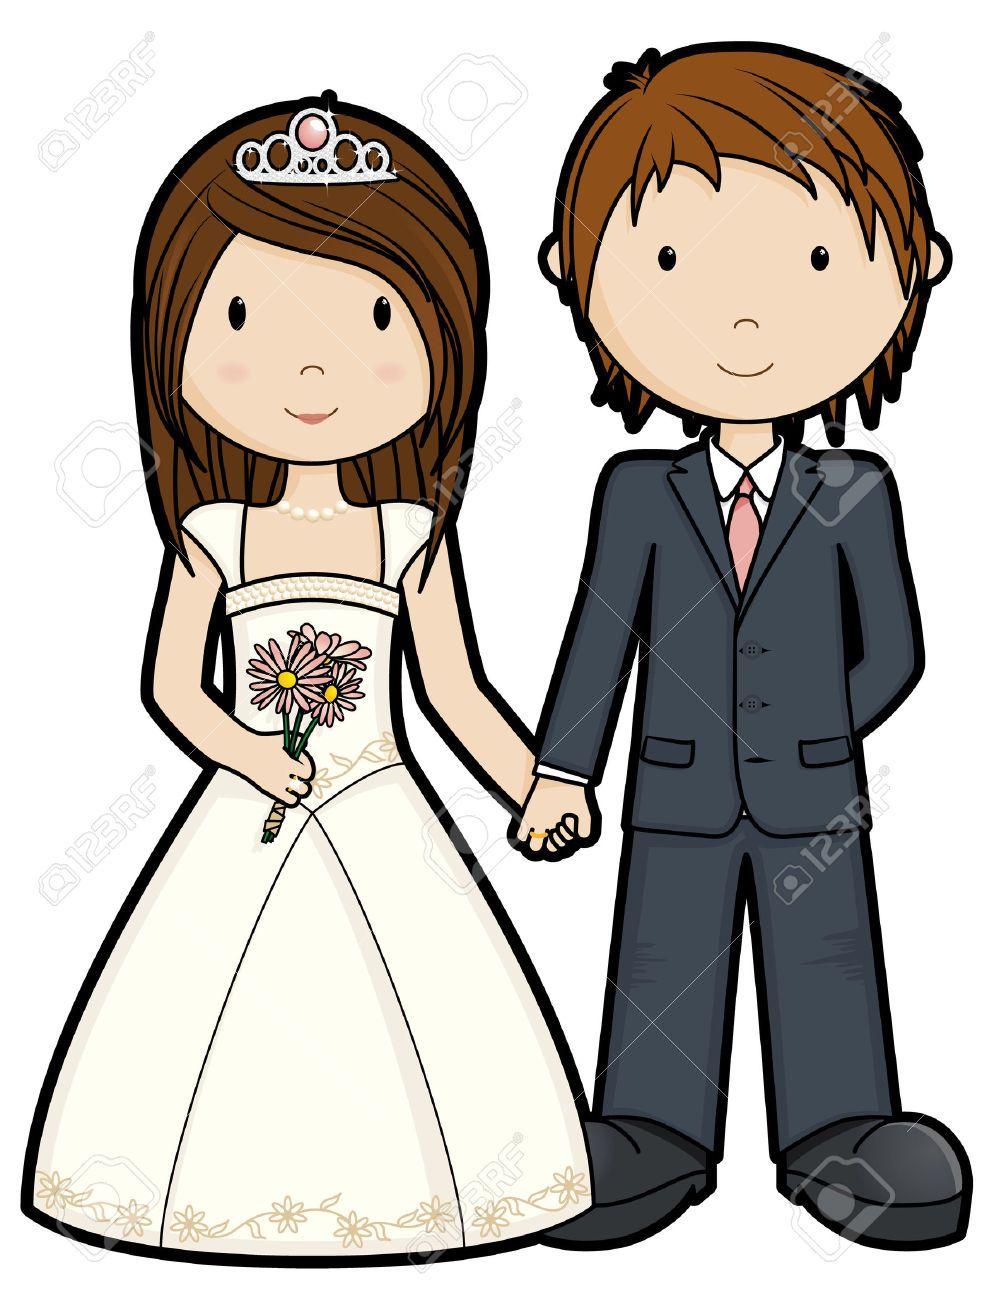 Cartoon wedding couple clipart clip art stock Stock Vector | Photo | Wedding images, Just married, Wedding clip art stock